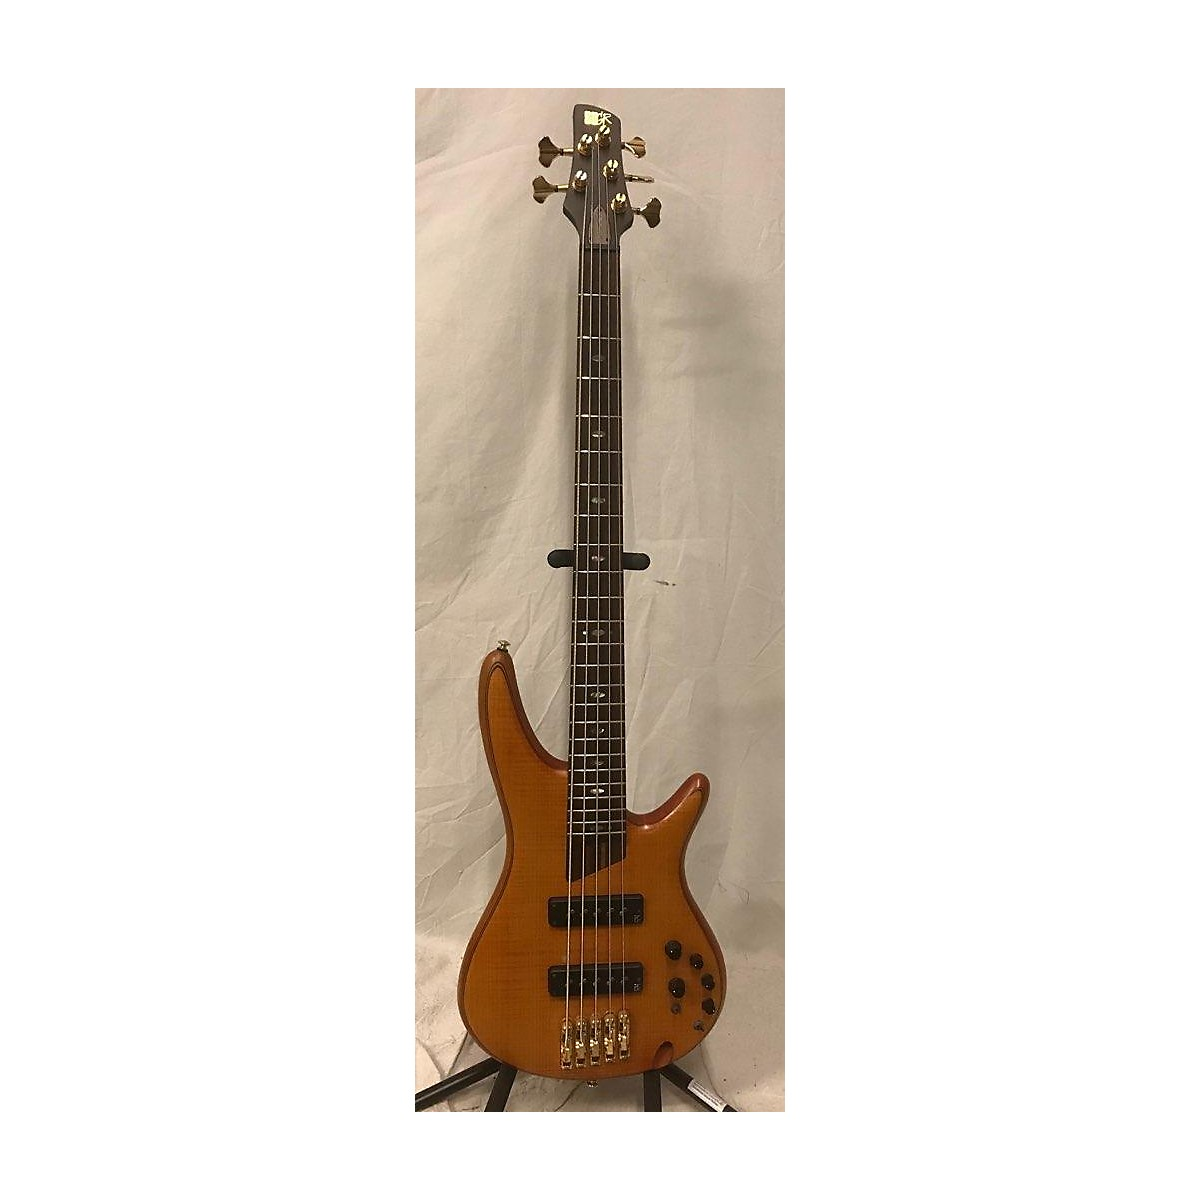 Ibanez SR1405E 5 String Electric Bass Guitar